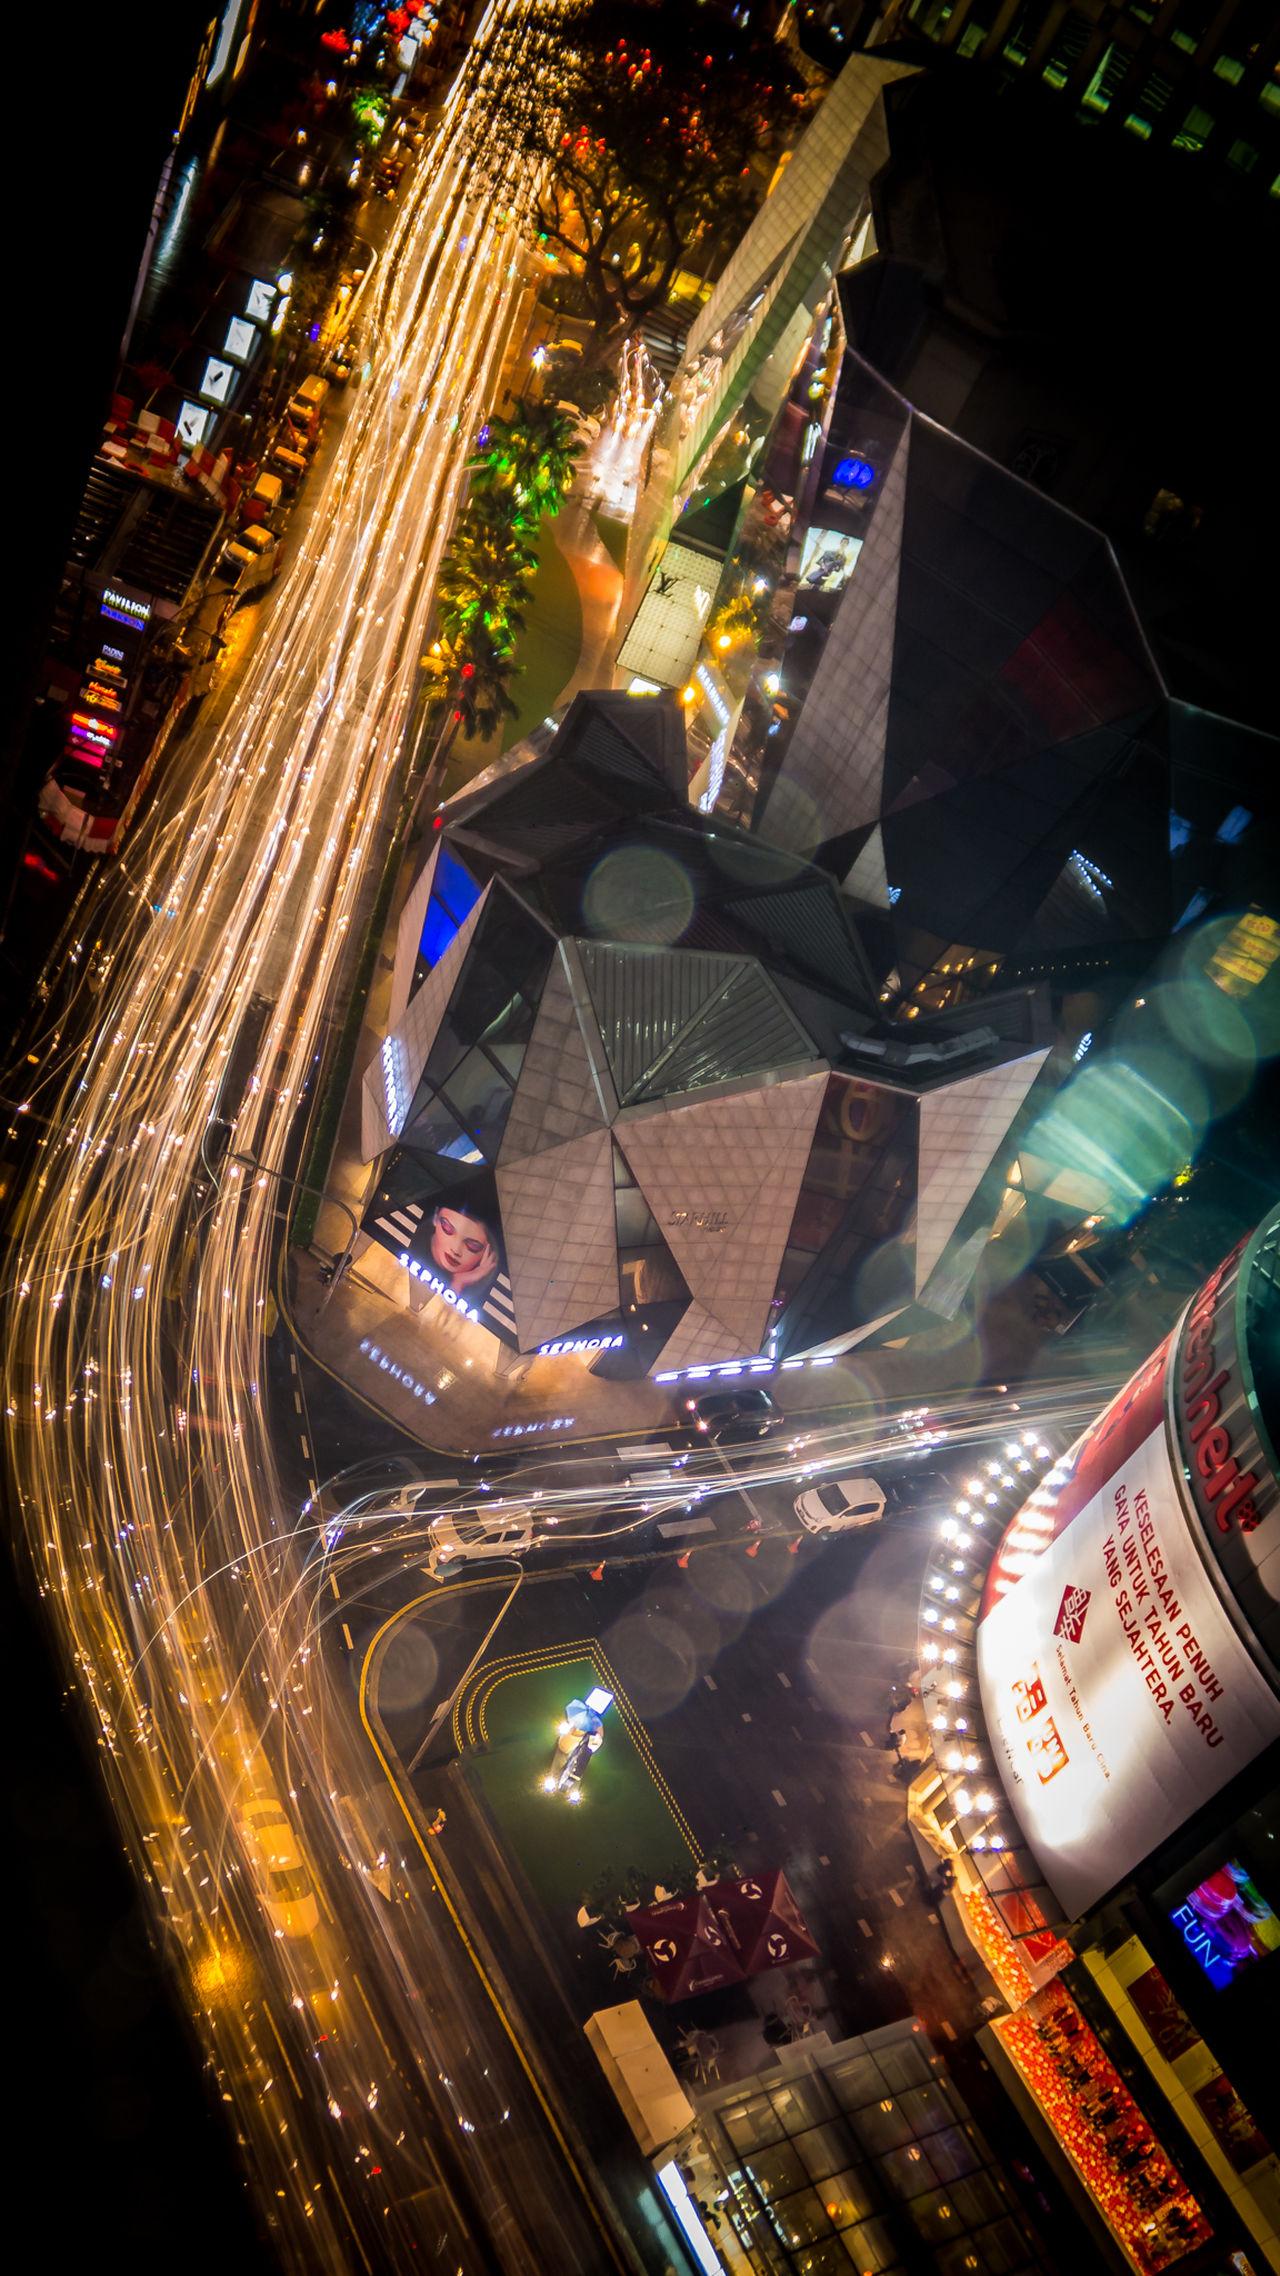 Cities At Night City City Life City Street Fiber Optics Ghosting Illuminated Light Thread Light Trail Long Exposure Modern Multi Colored Night No People Outdoors Road Tilt Traffic Travel Destinations